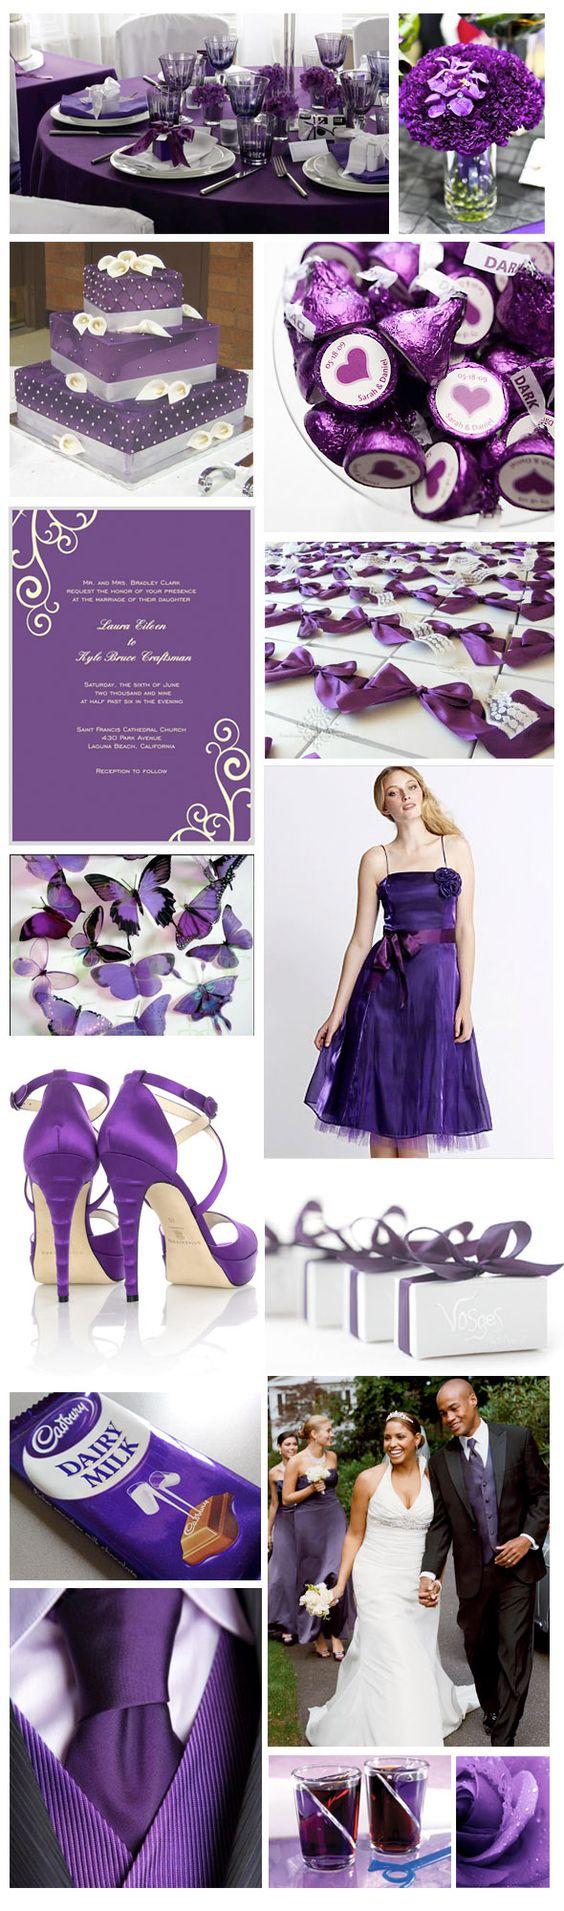 Cadbury Purple Wedding Theme Ideas